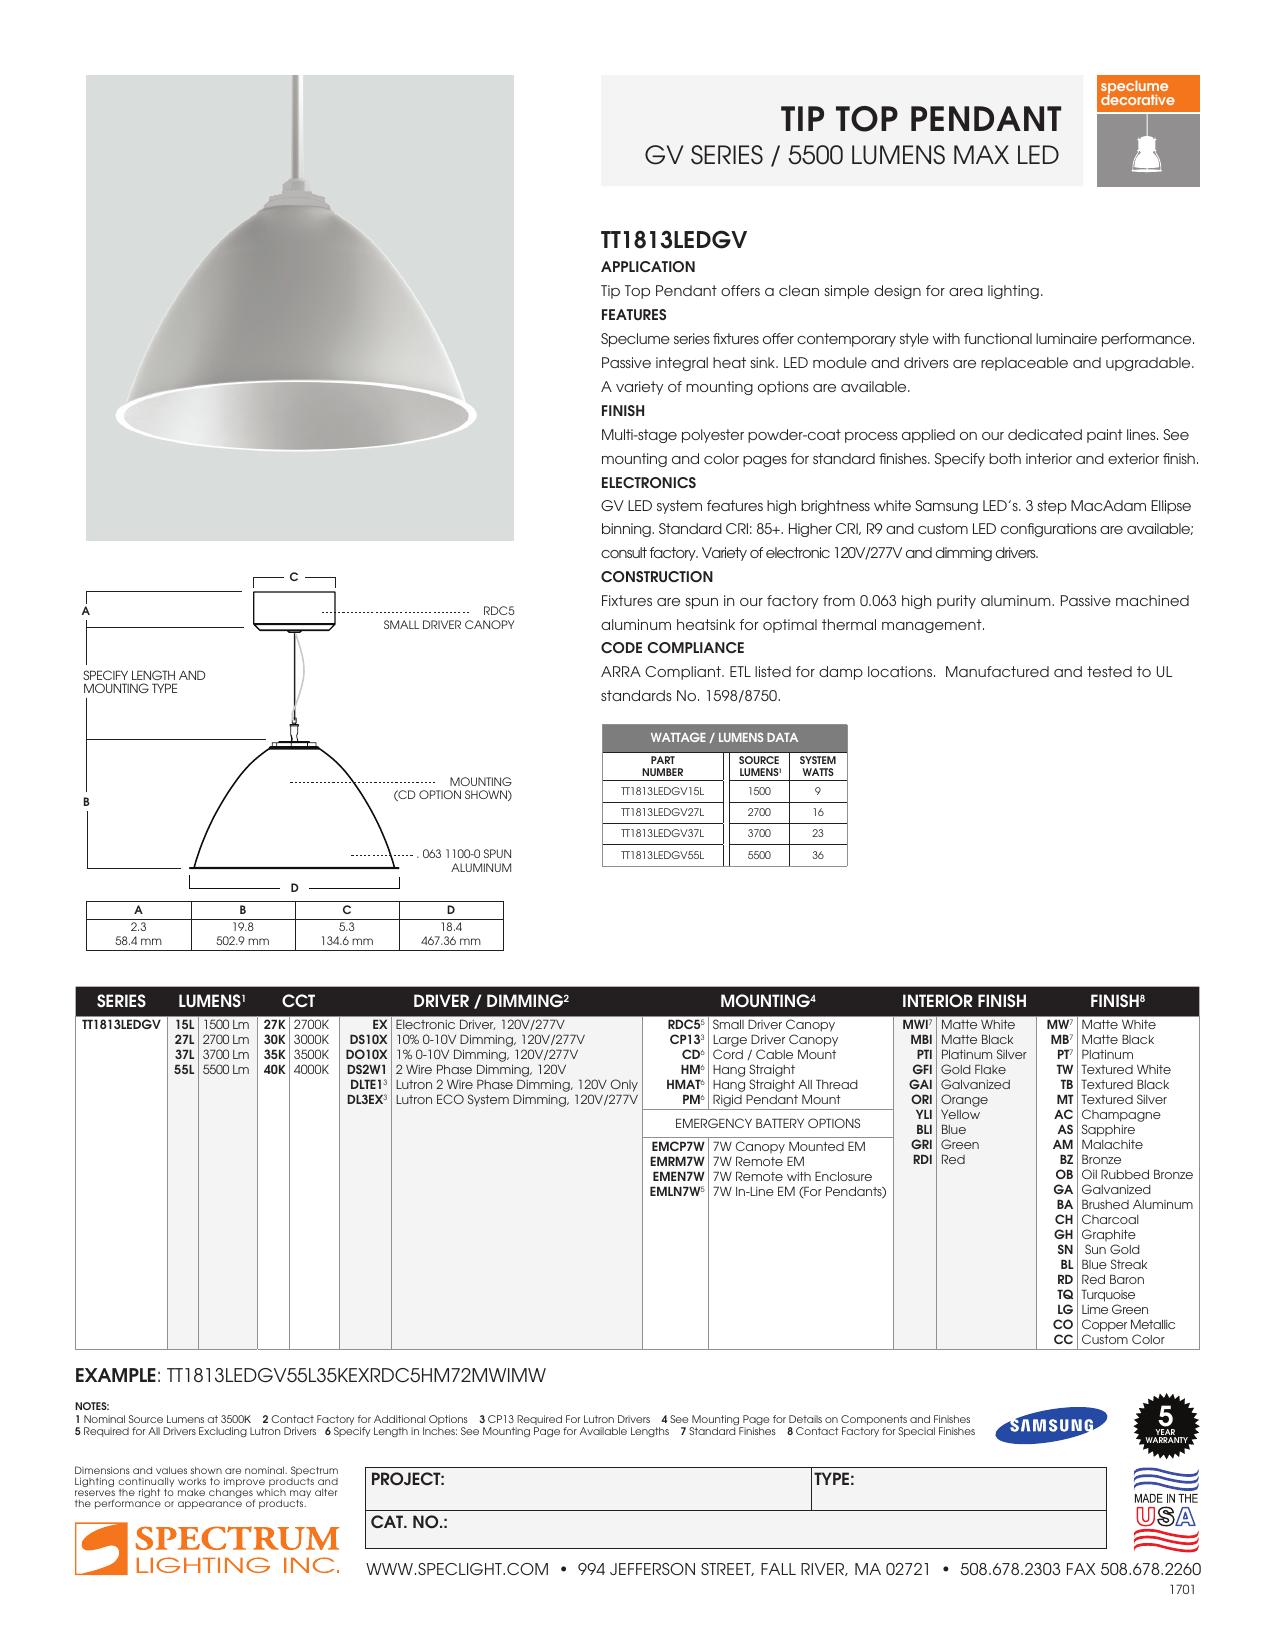 Tip Top Pendant Spectrum Lighting Manualzz